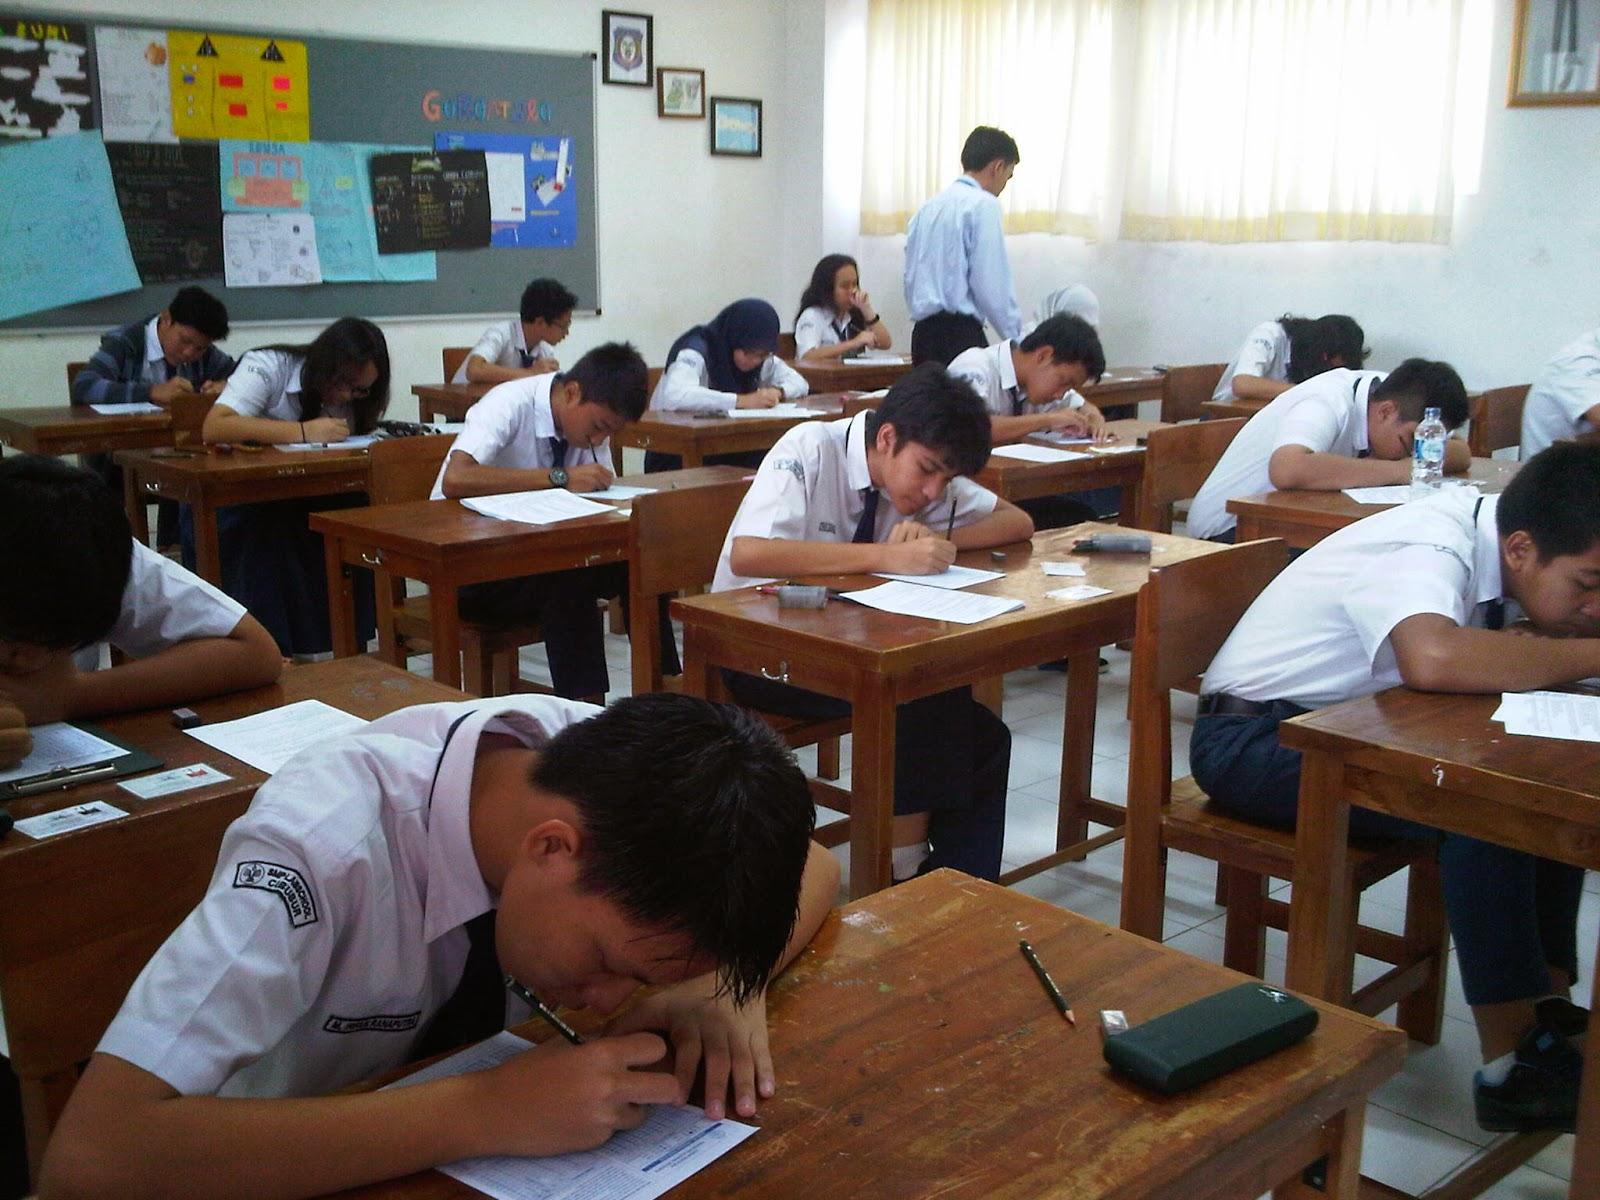 Jadikan Pendidikan sebagai Prioritas Utama-maribelajar.blogspot.com